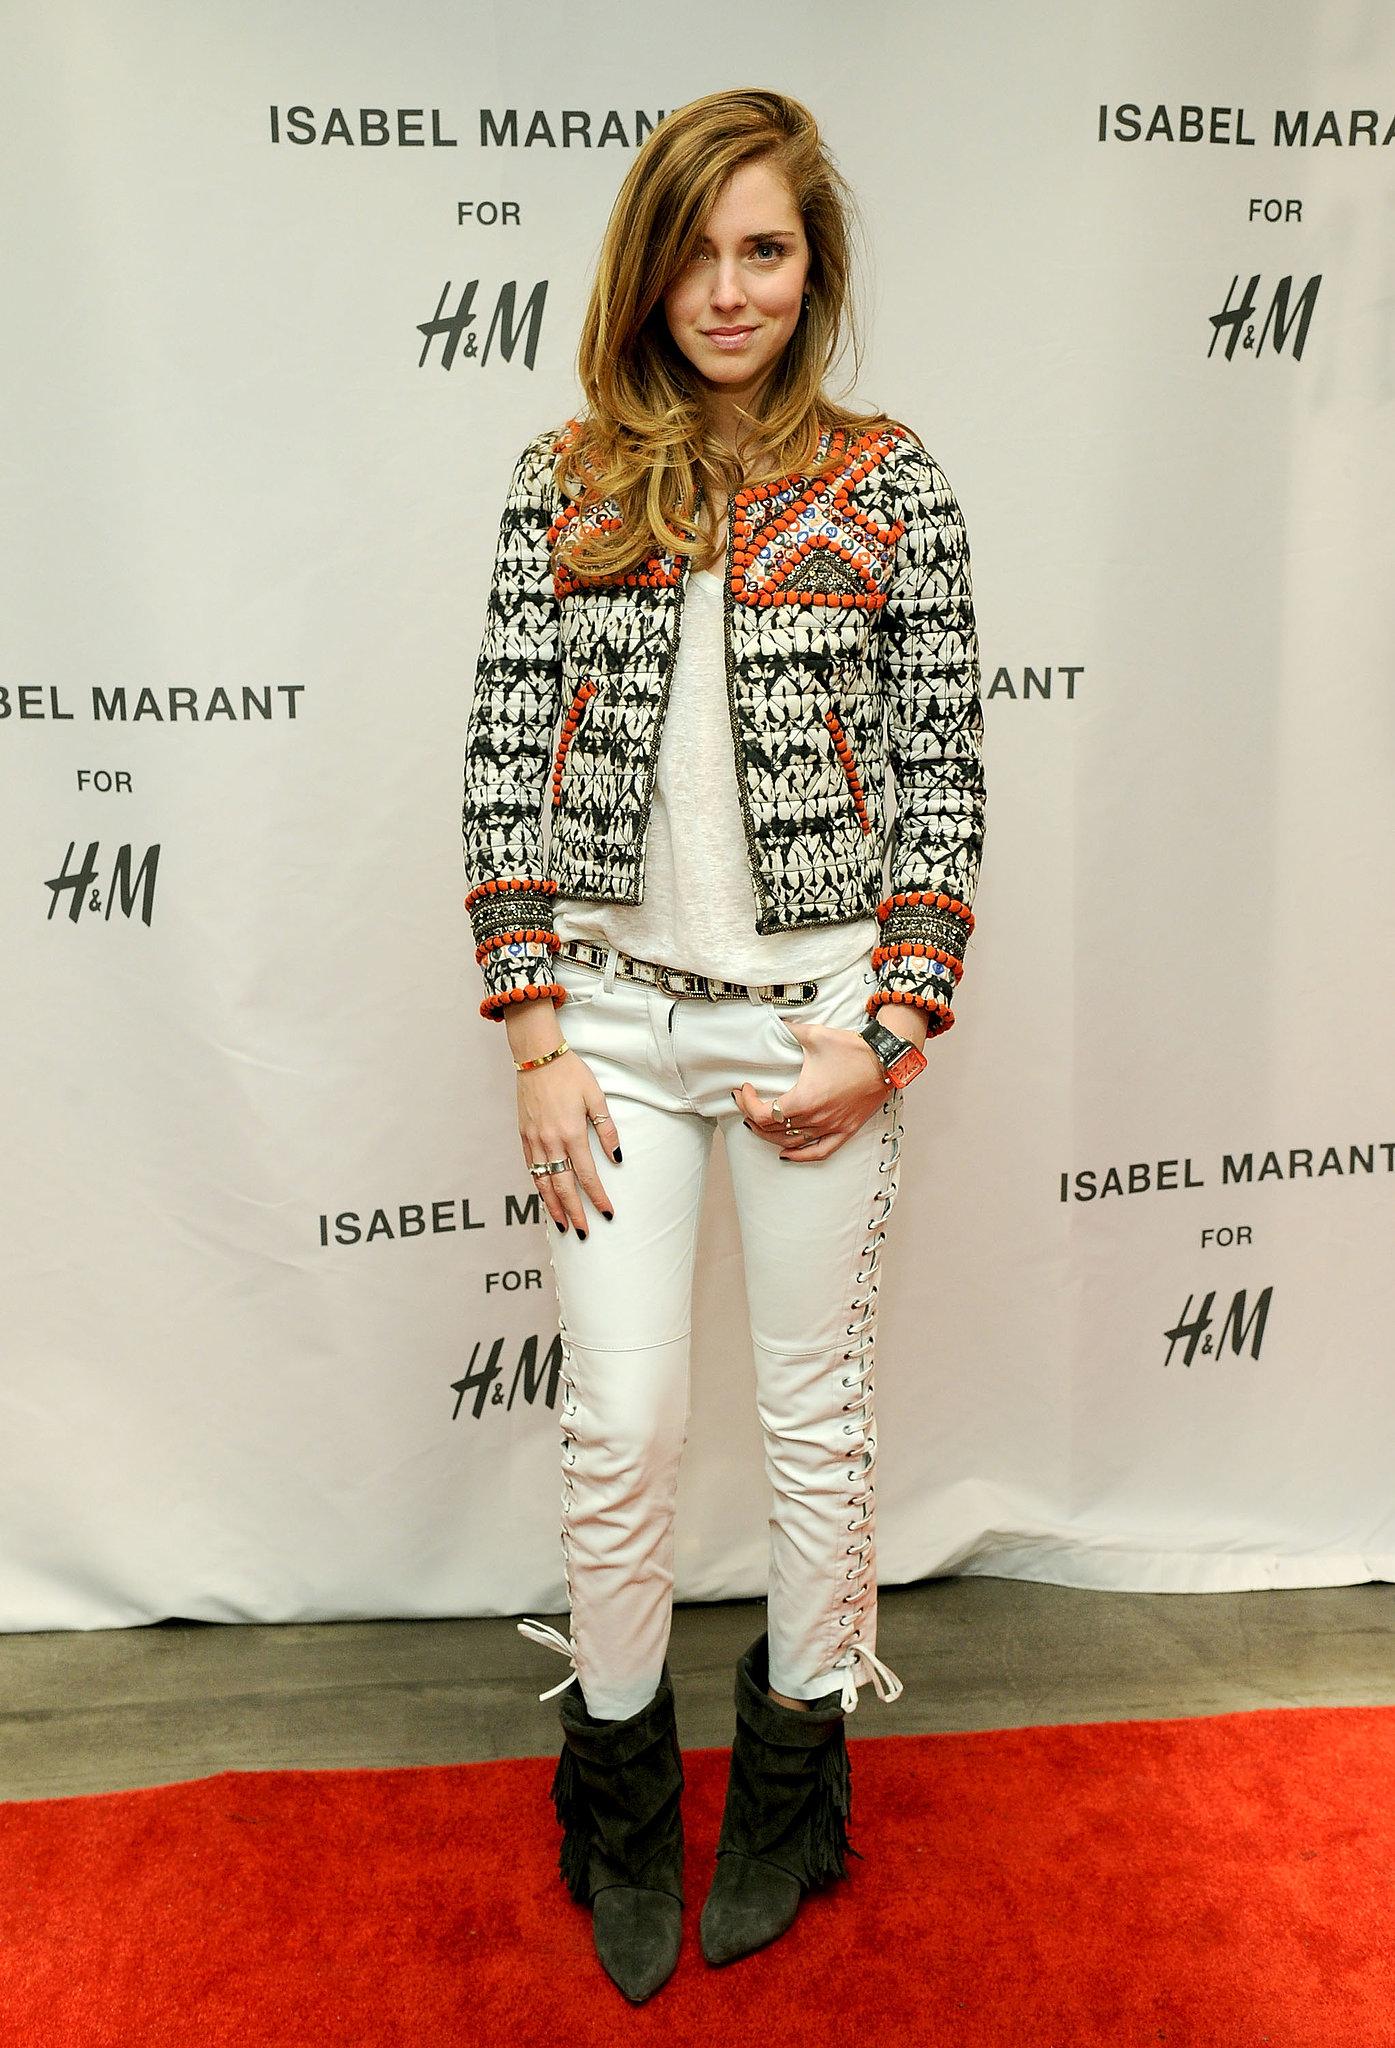 Chiara Ferragni at the H&M Isabel Marant VIP event.